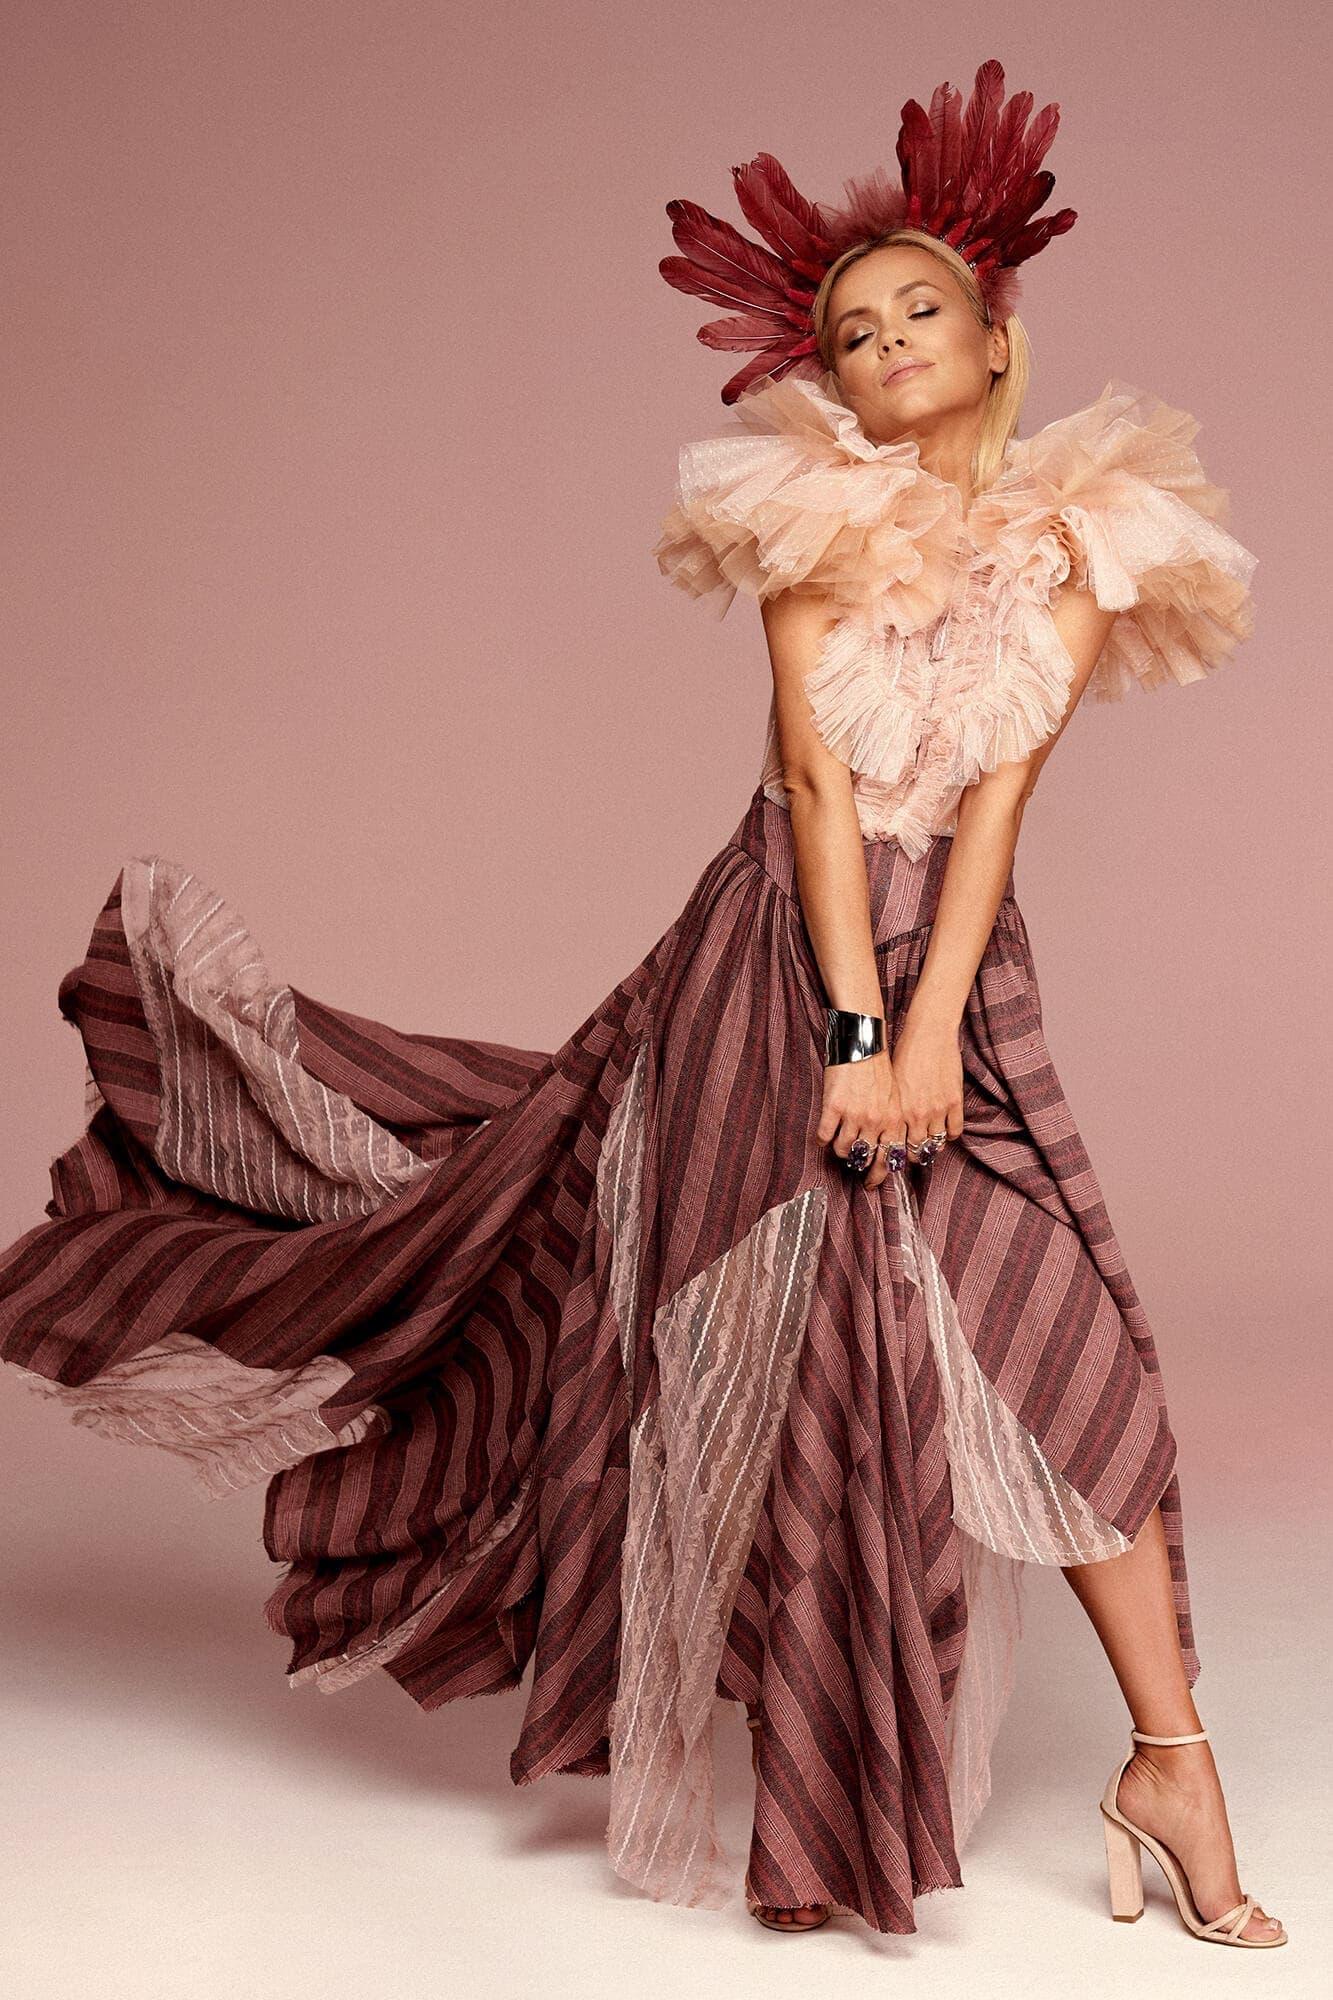 Spódnica w odcieniach różu no. 11 Haute Couture collection Haute Couture 11